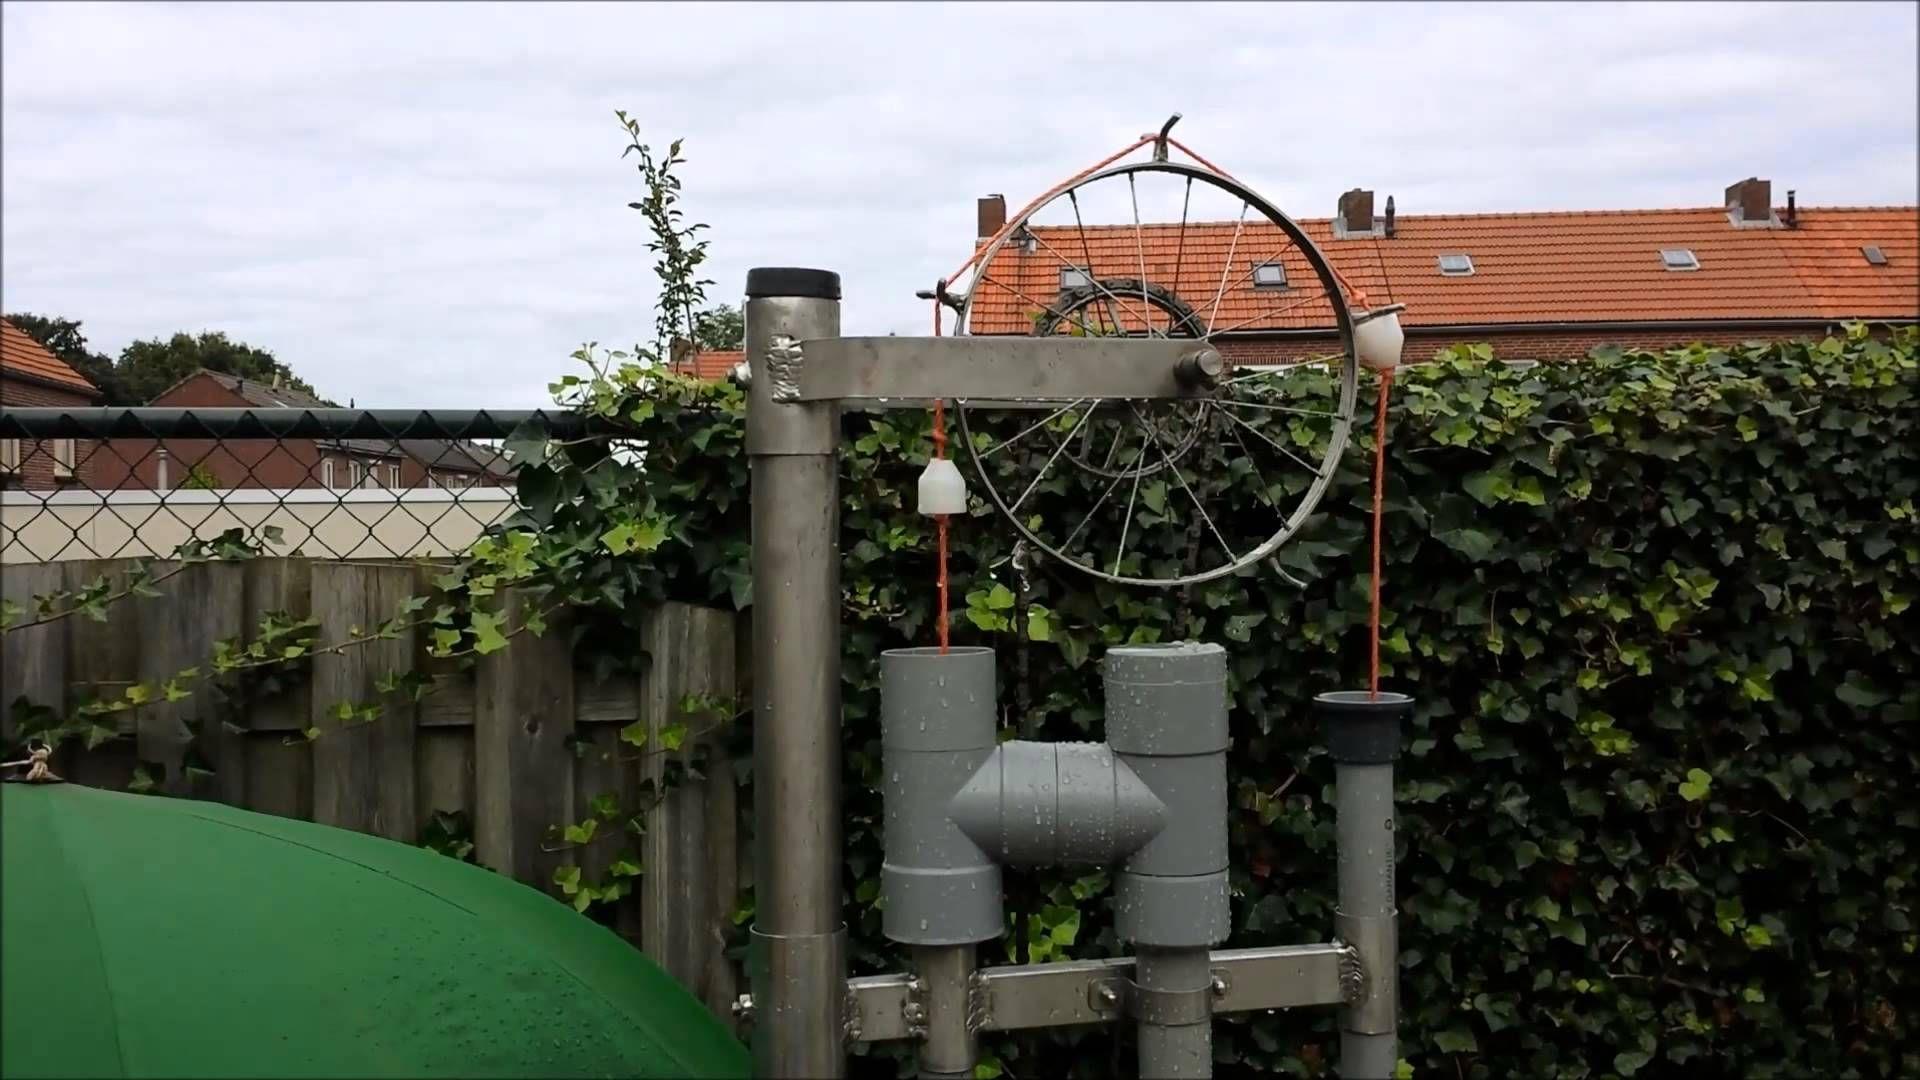 Touwpomp rope pump Seilpumpe stirling engine heteluchtmotor.